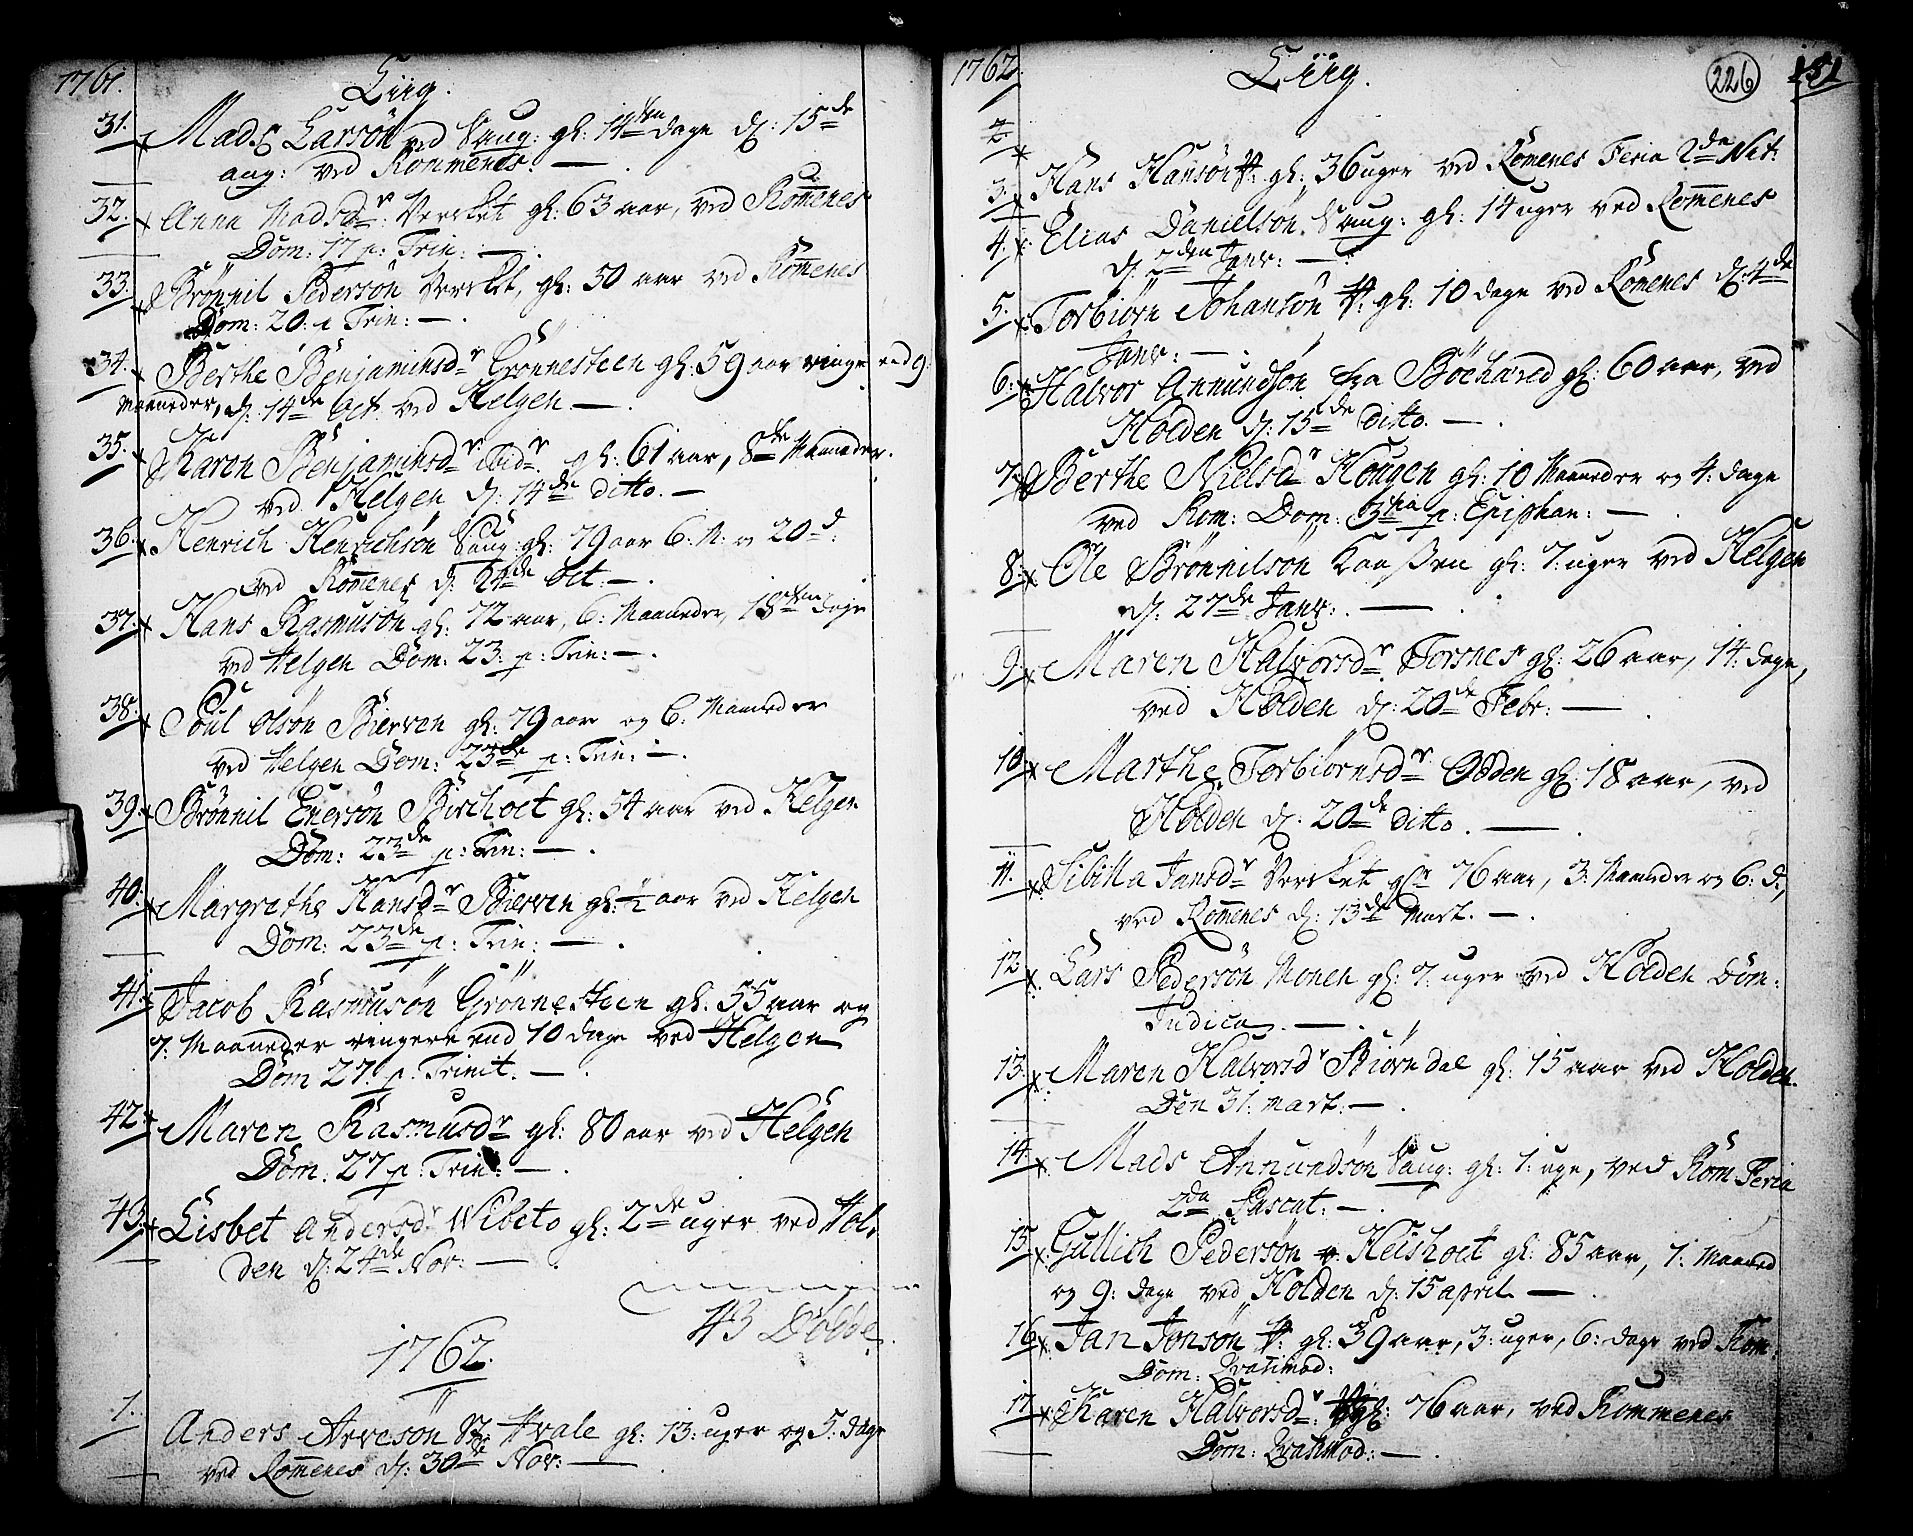 SAKO, Holla kirkebøker, F/Fa/L0001: Ministerialbok nr. 1, 1717-1779, s. 226